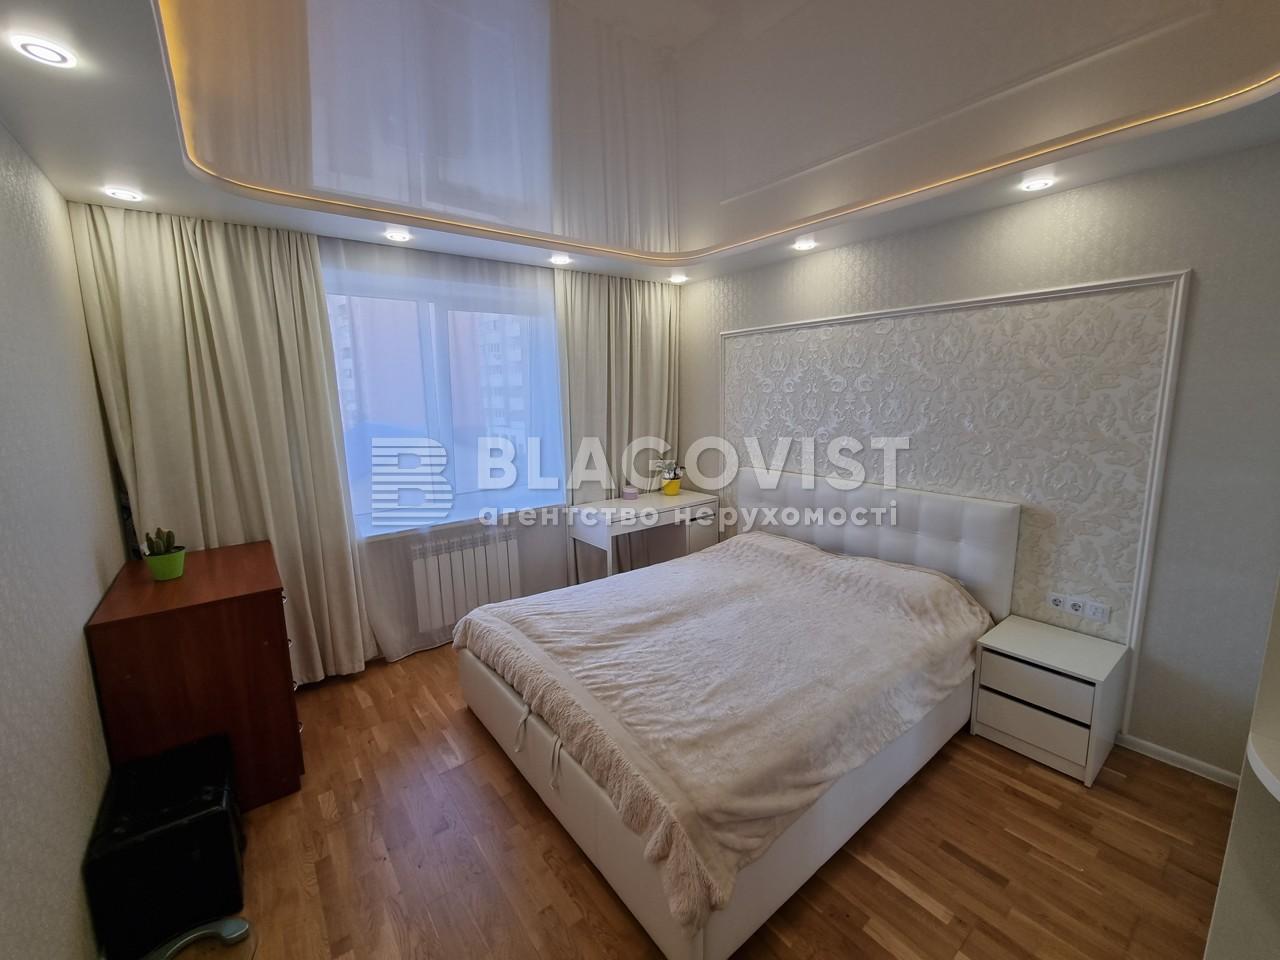 Квартира H-50634, Доковская, 10 корпус 6, Коцюбинское - Фото 5